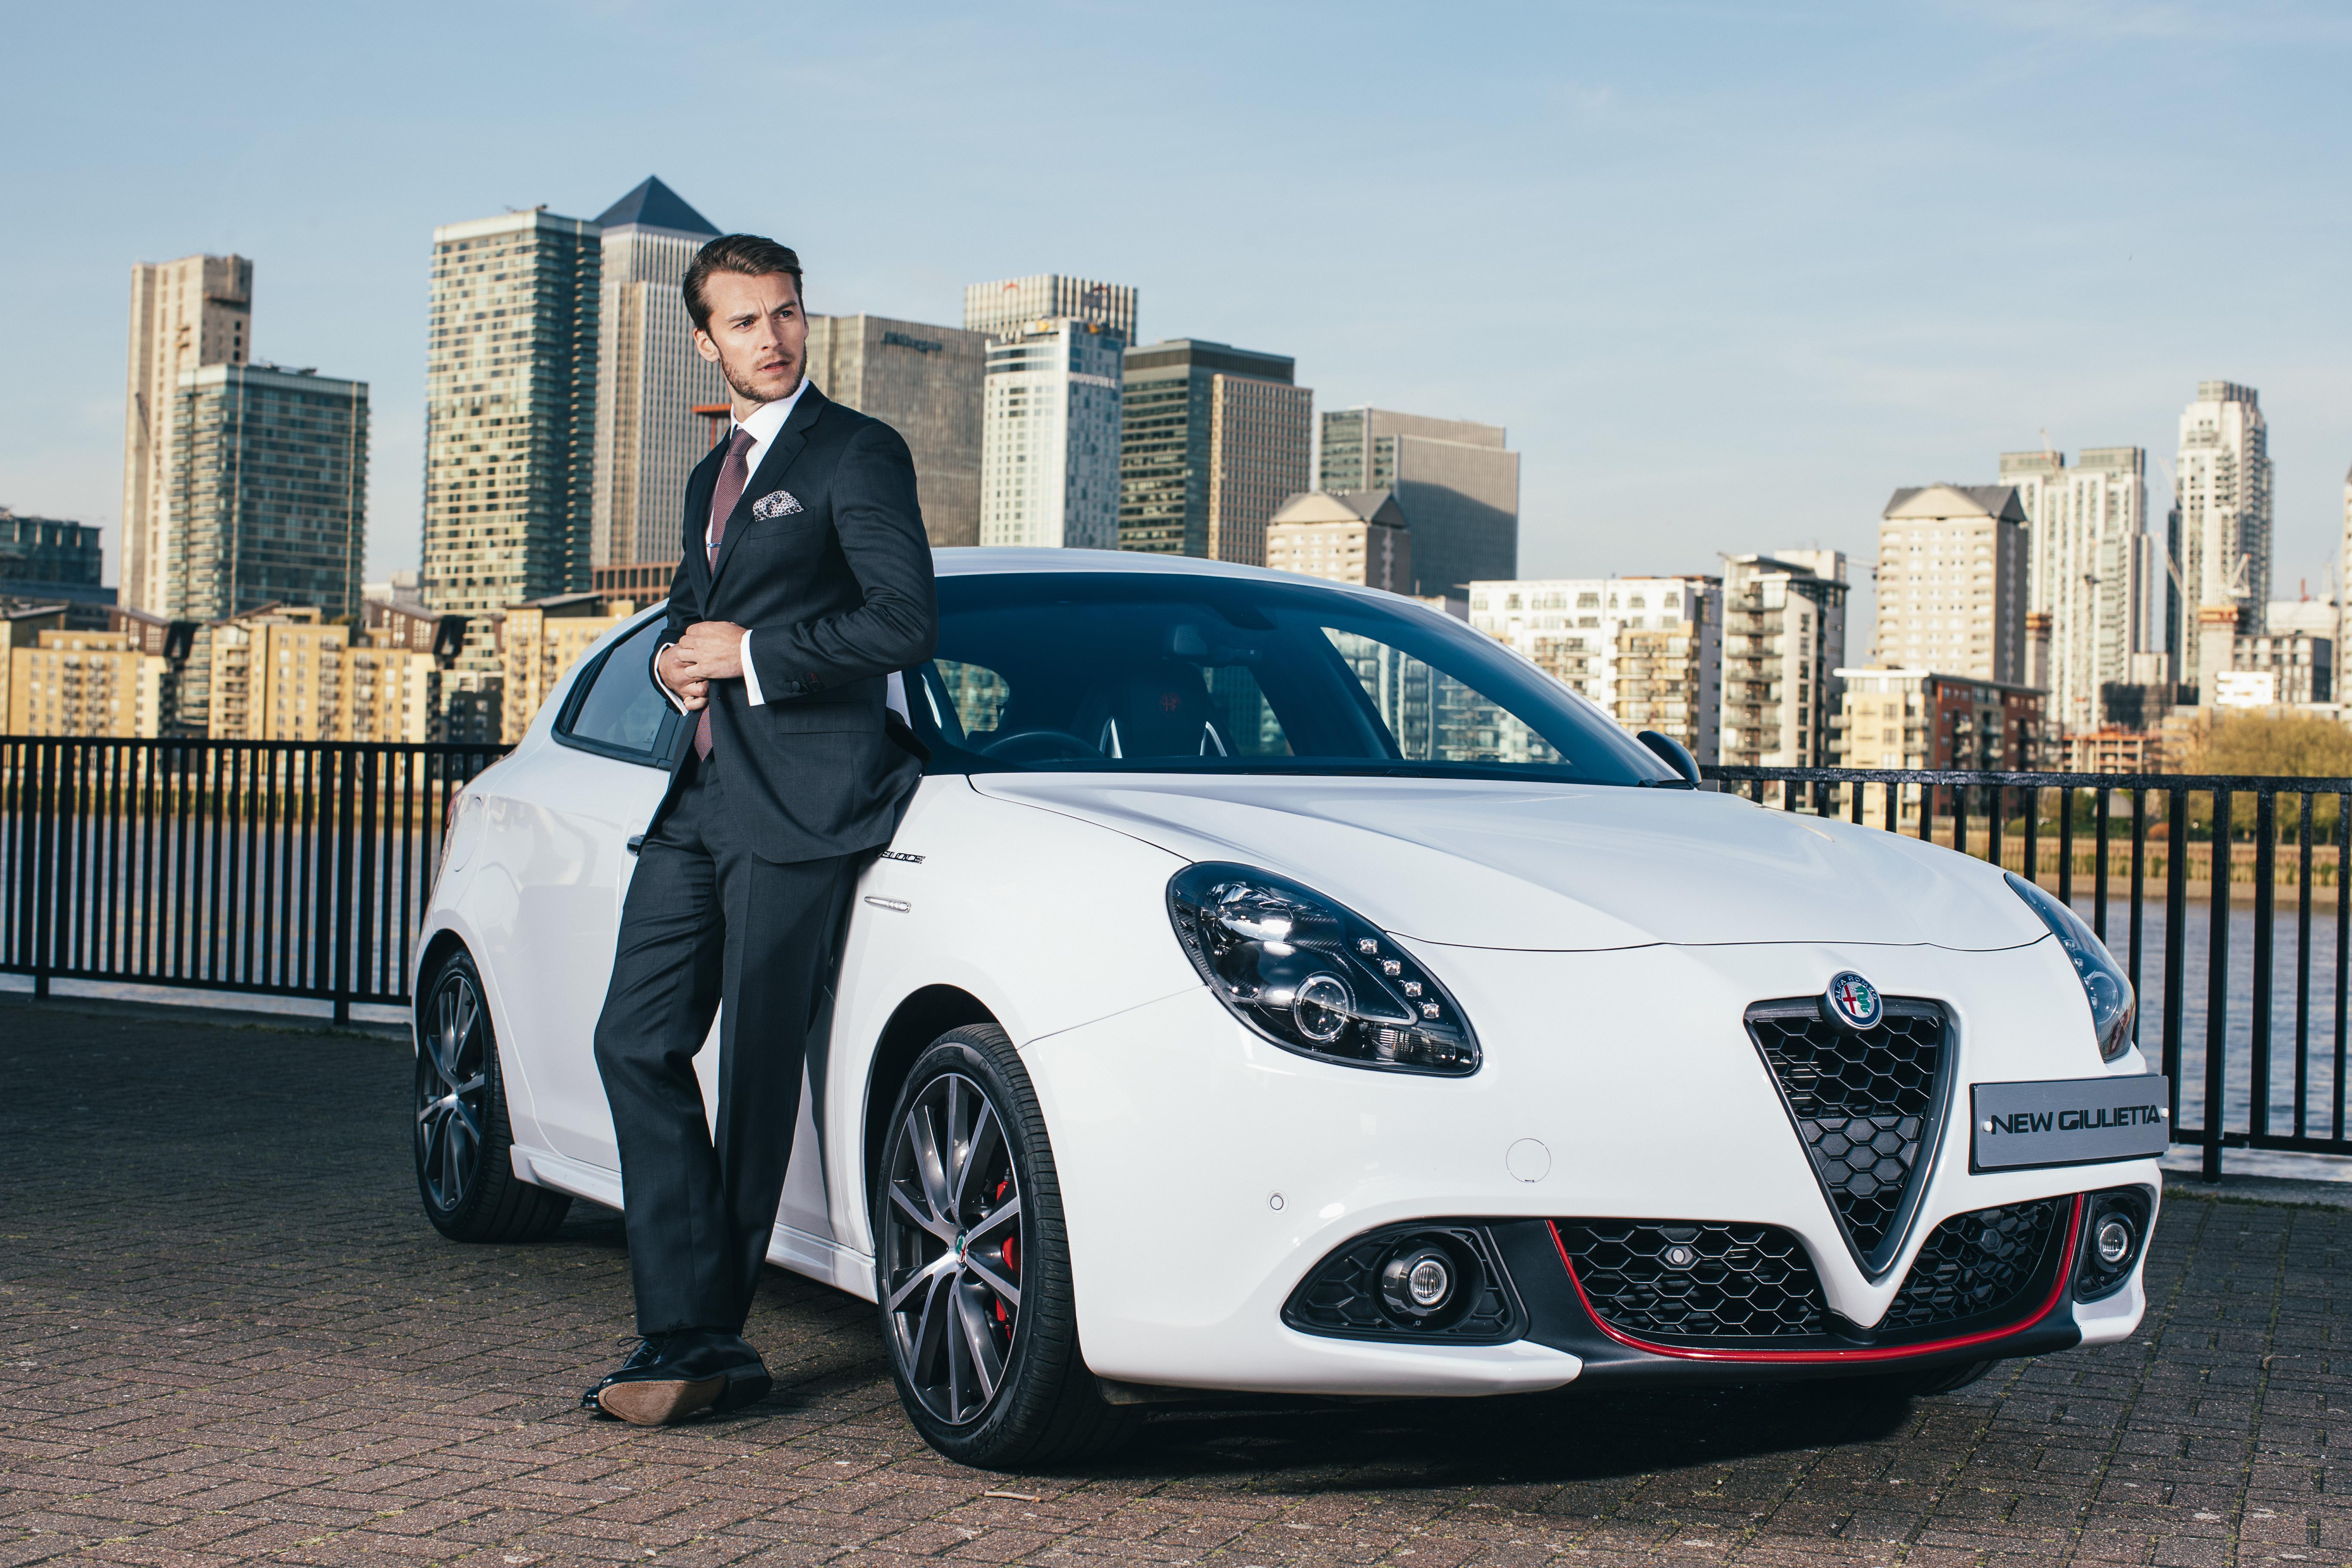 Alfa Romeo Mito >> ALFA ROMEO PARTNERS WITH BRITISH TAILOR HAWES & CURTIS TO CREATE CUTTING EDGE HIGH PERFORMANCE ...